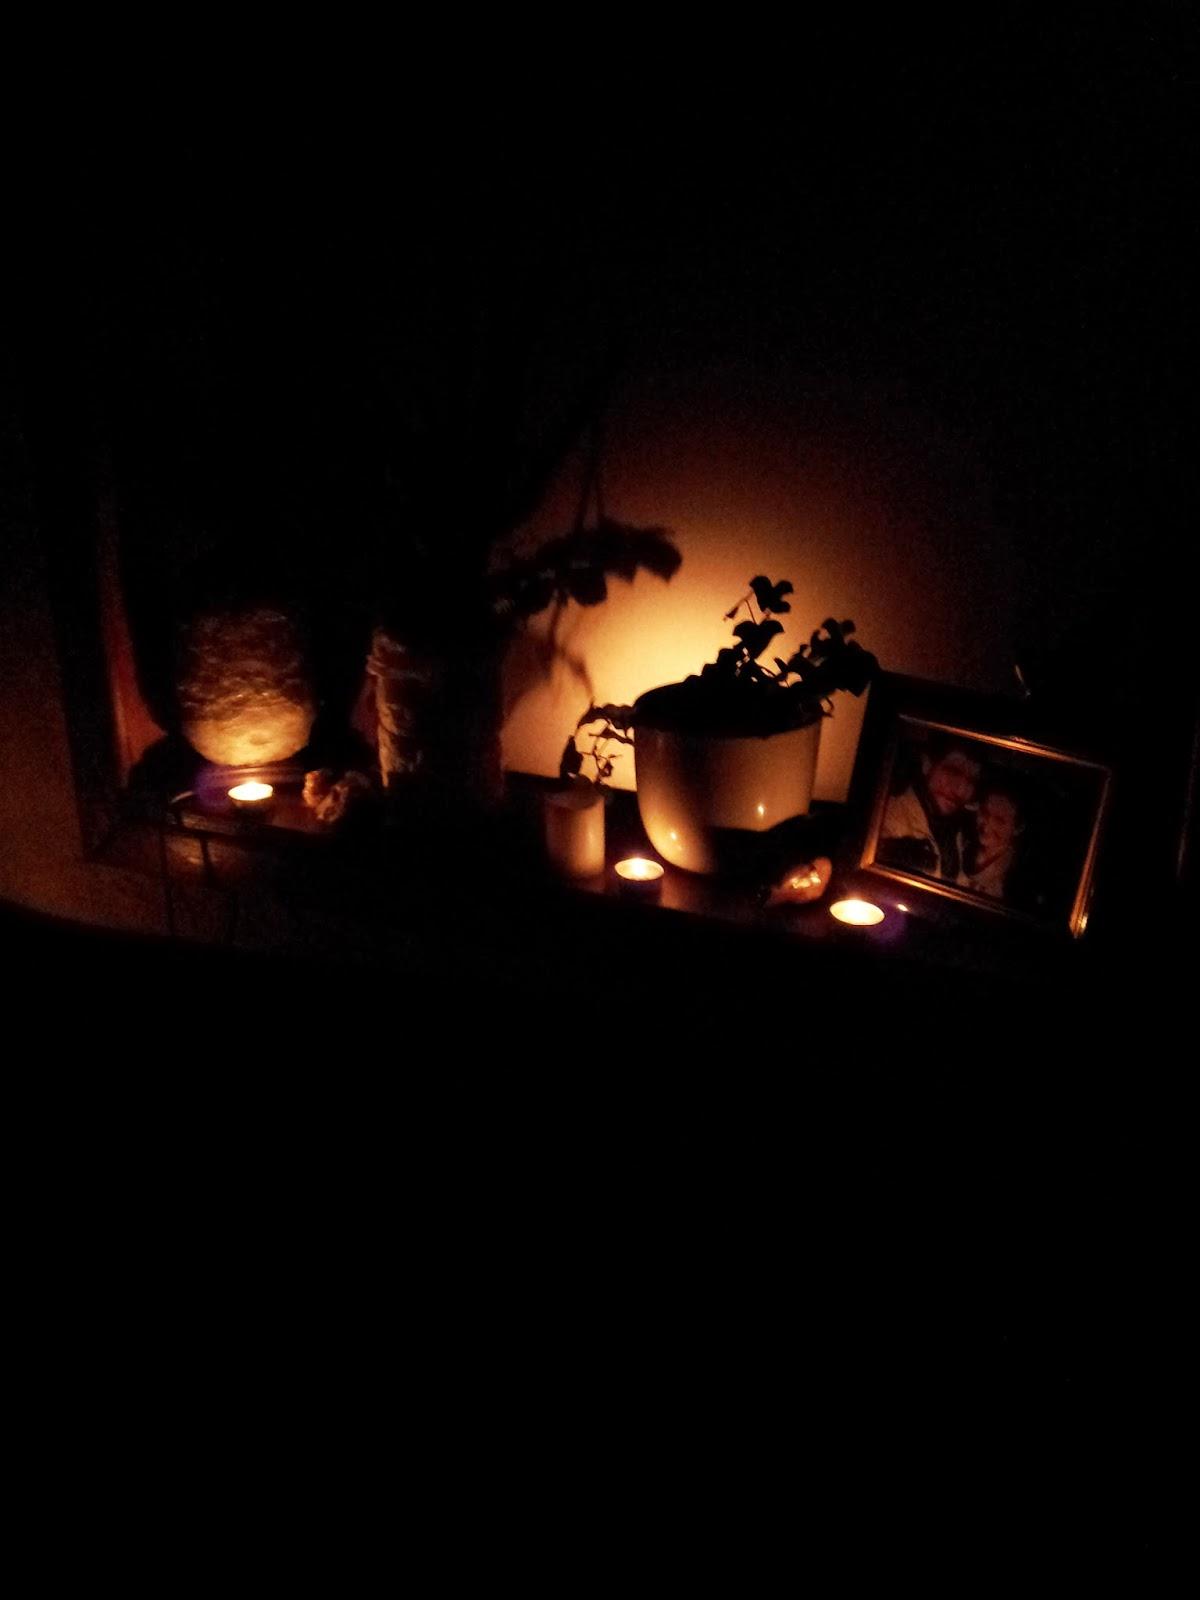 MY Pichka: A dark December